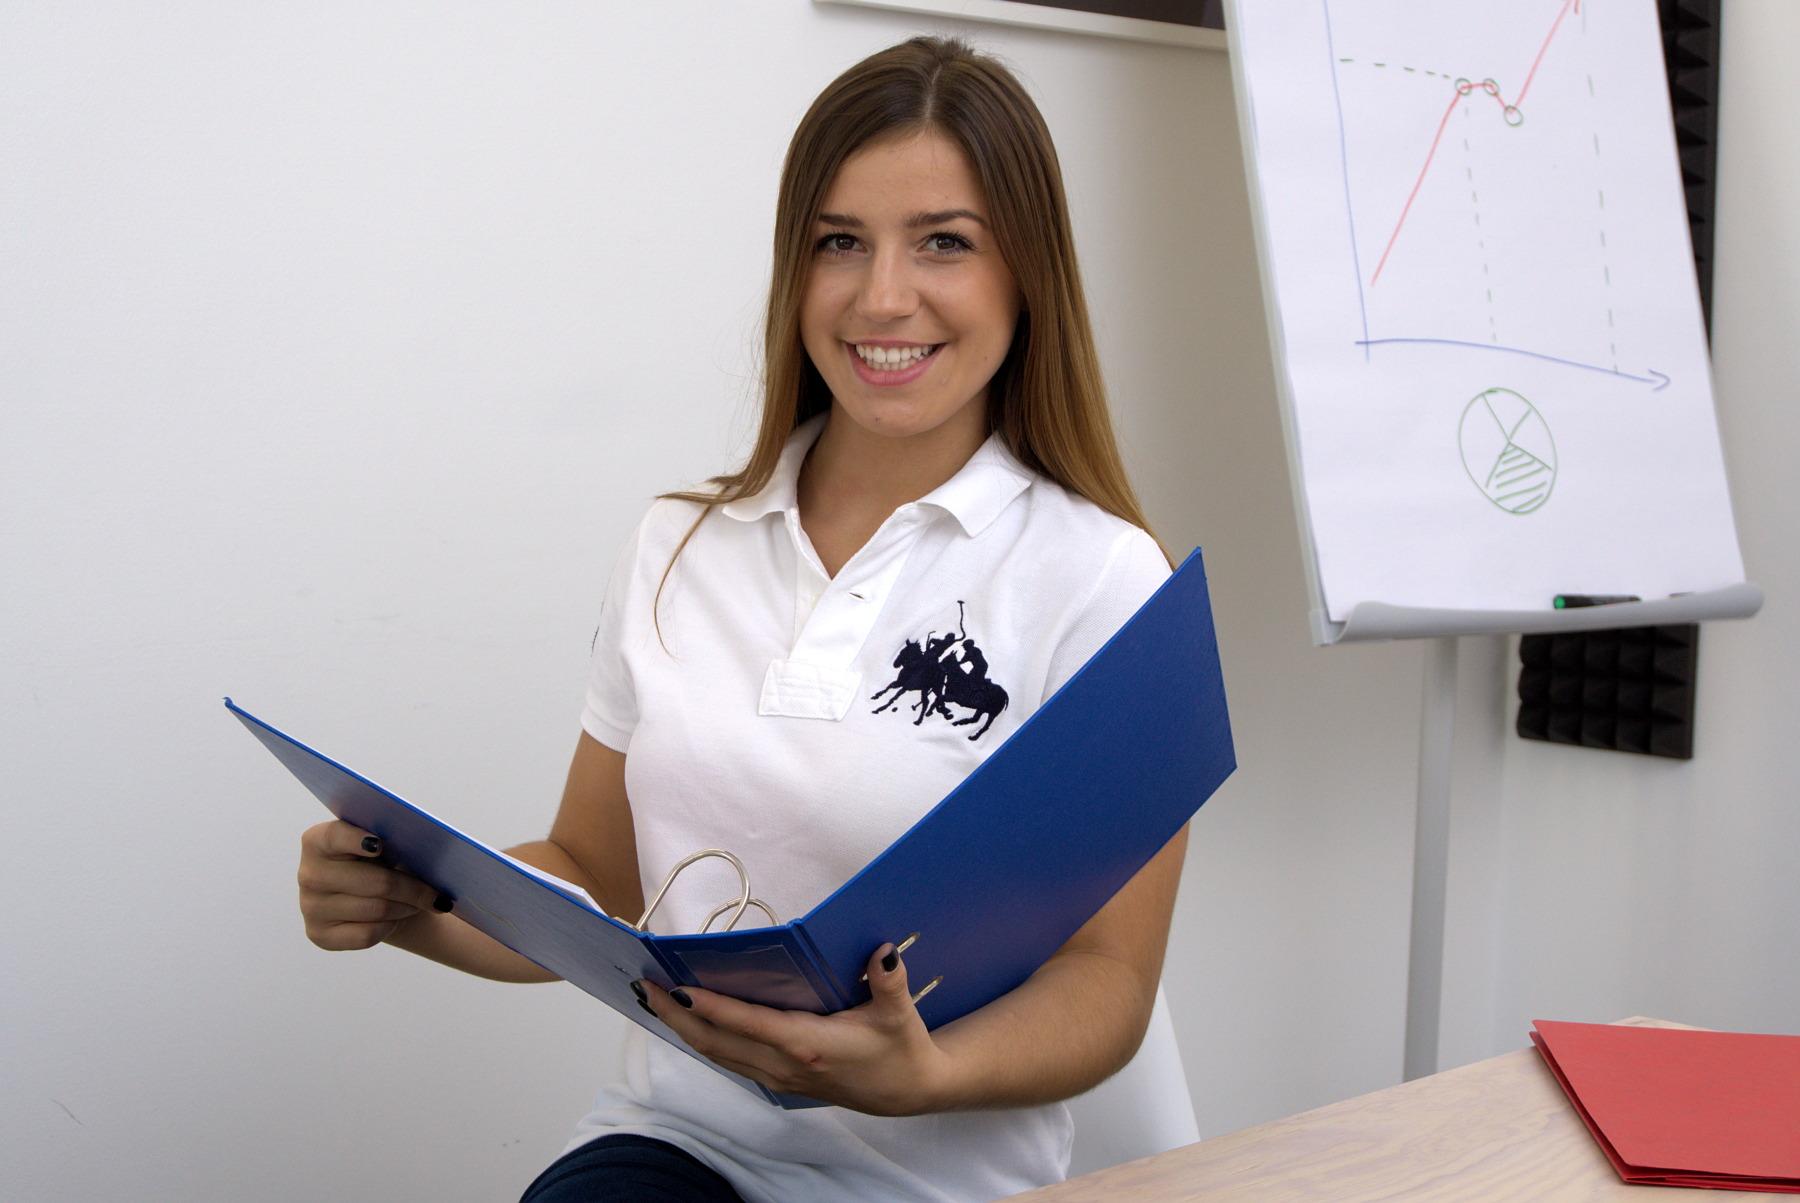 Frau mit Aktenordner lächelt